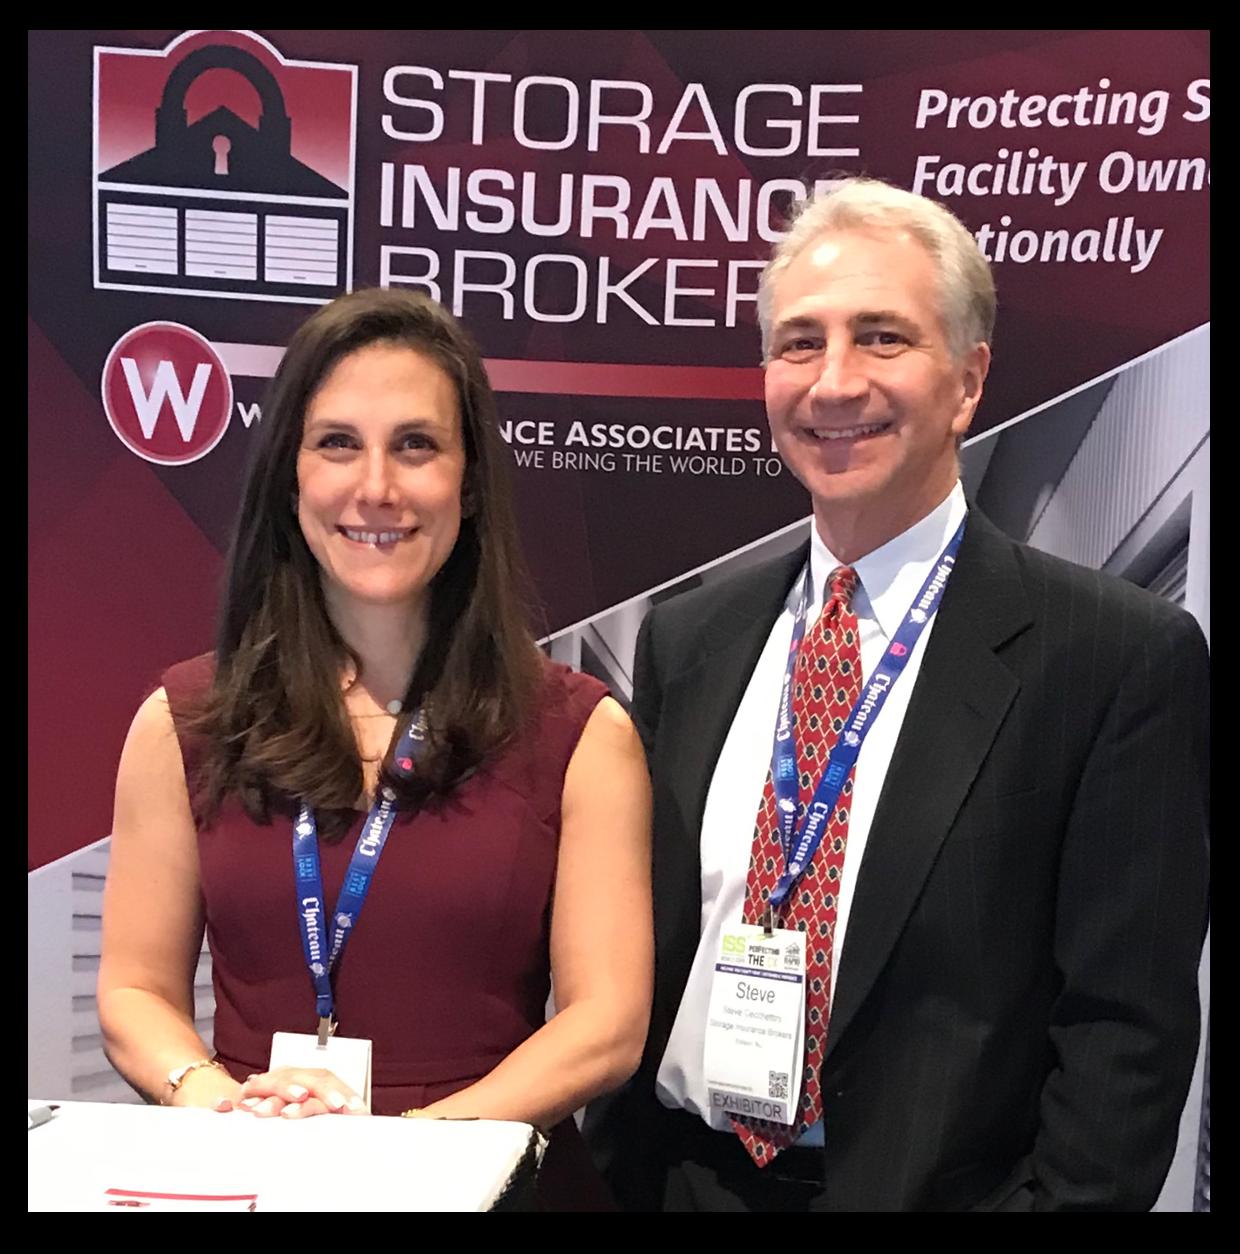 Jessica Lamoureux and Steve Cecchettini at a self storage event